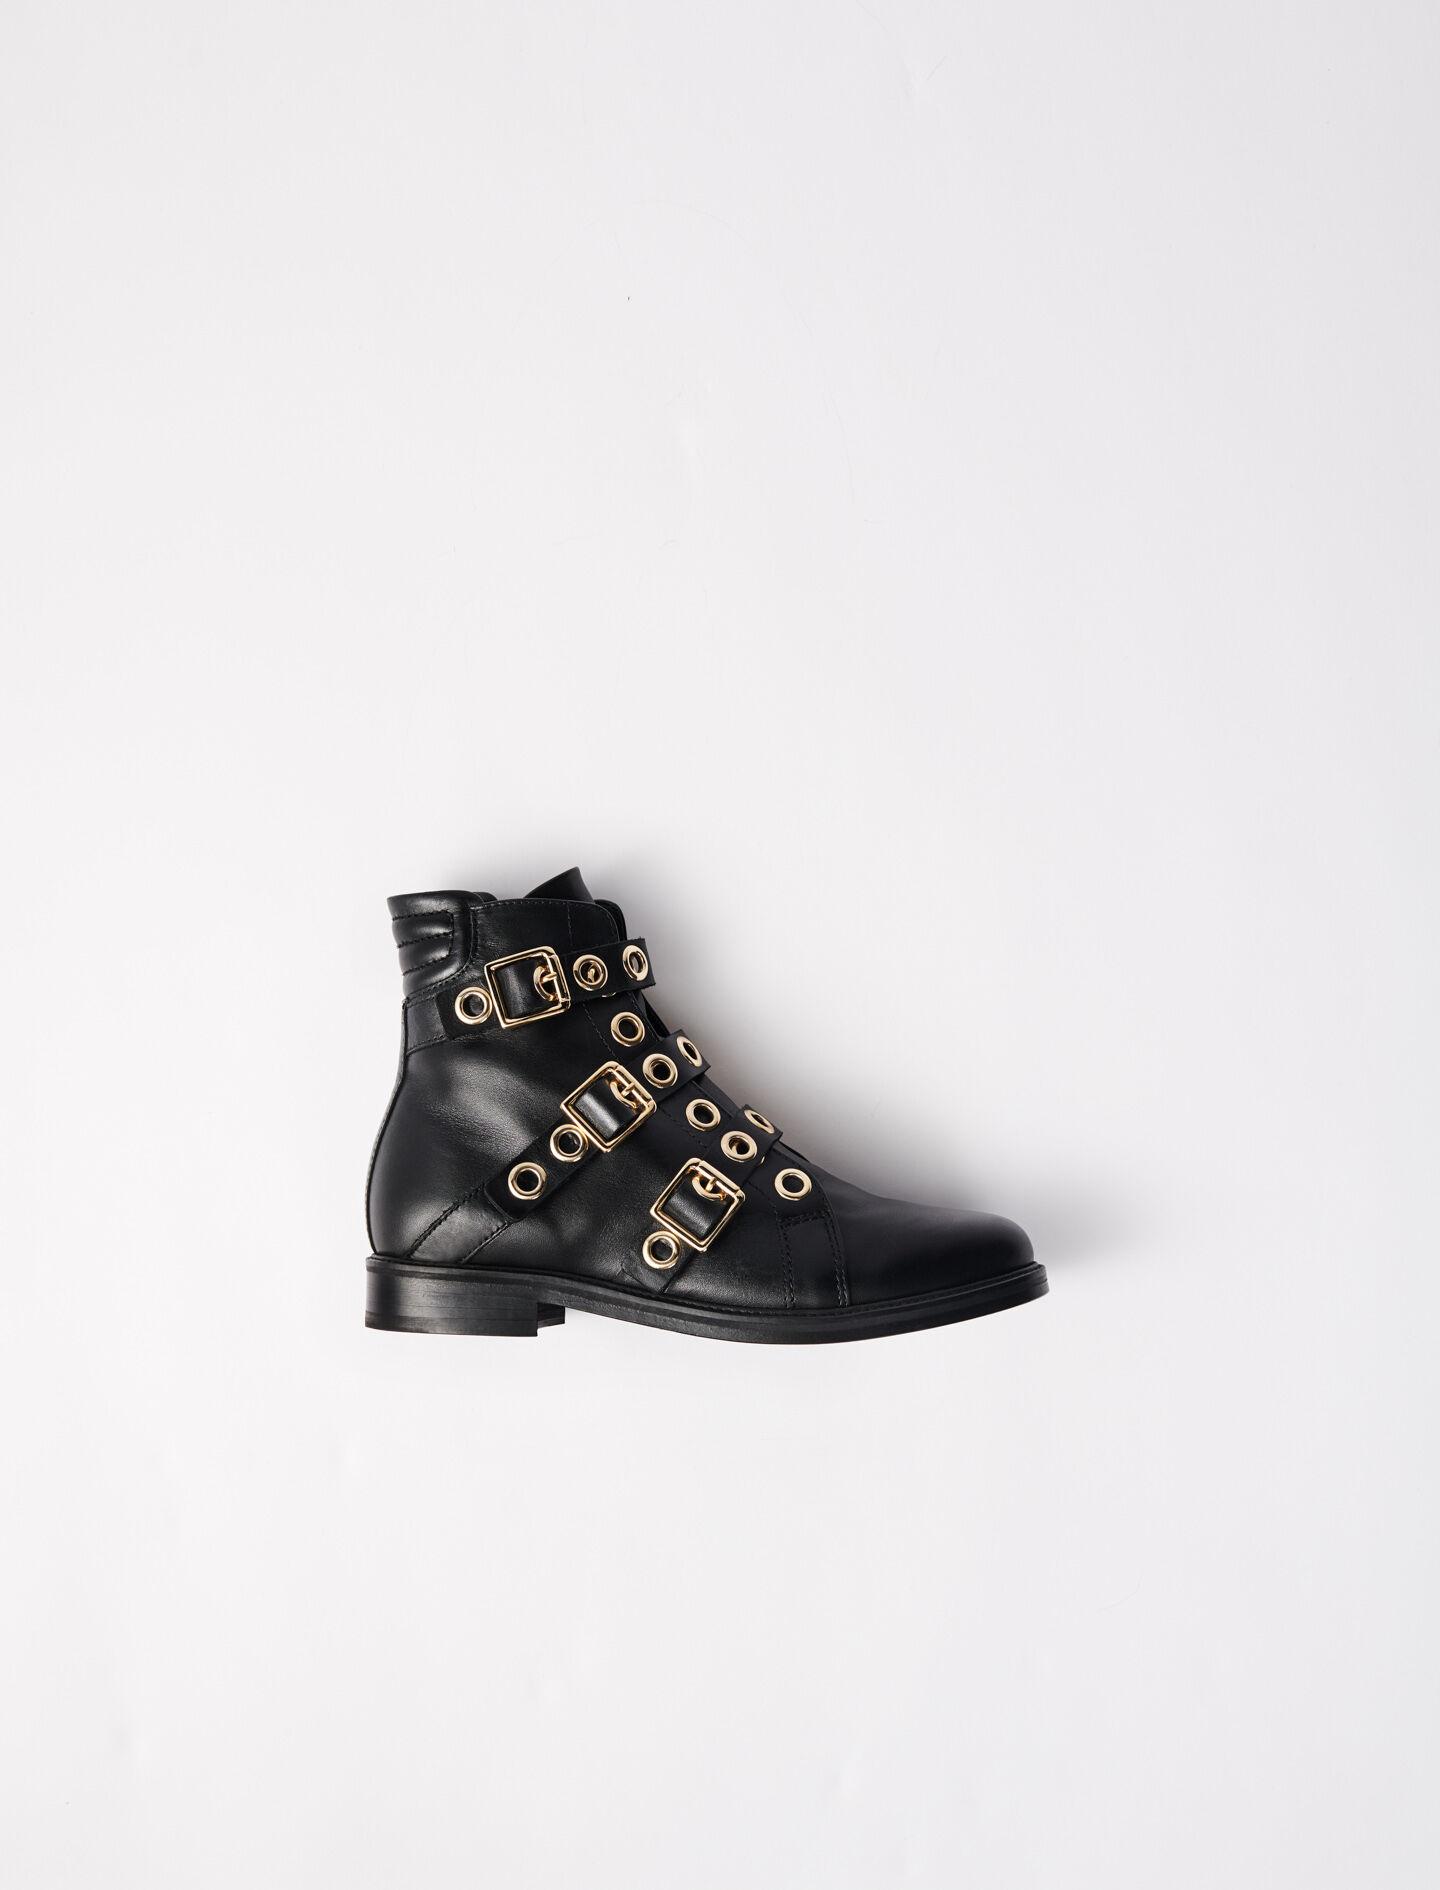 Shoes \u0026 Accessories on Sale - Women